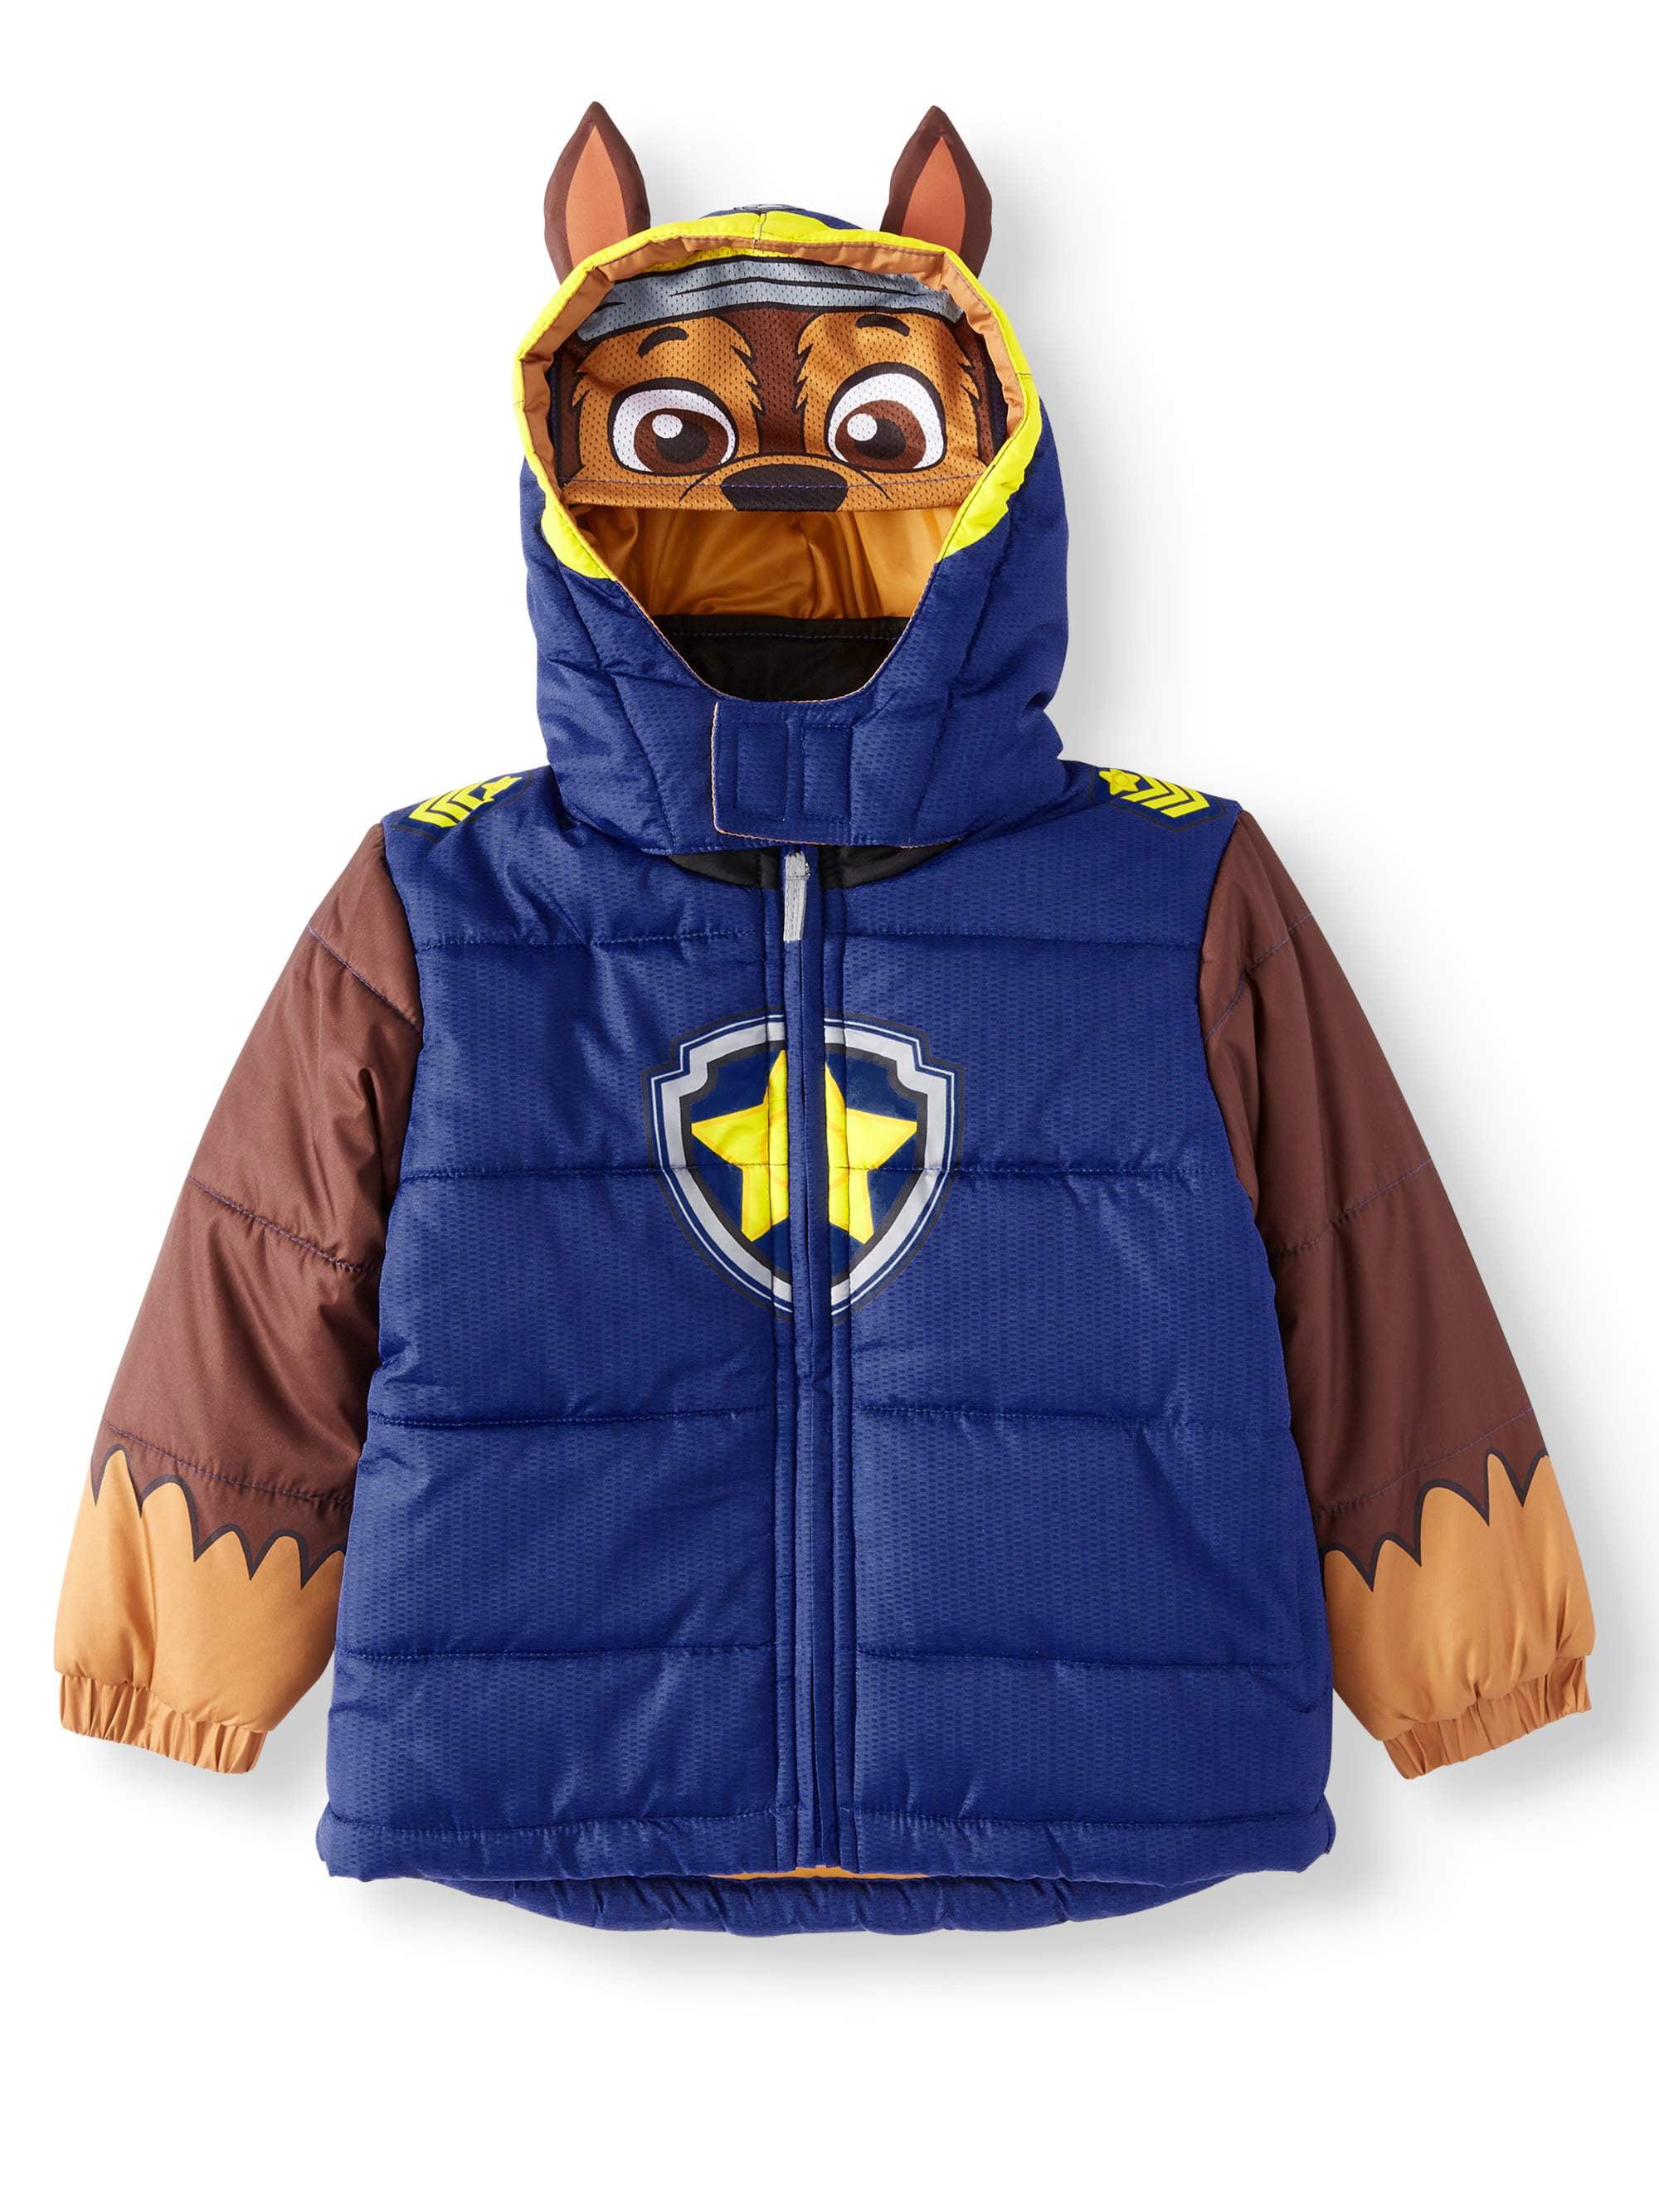 Costume Puffer Jacket Coat (Toddler Boys)